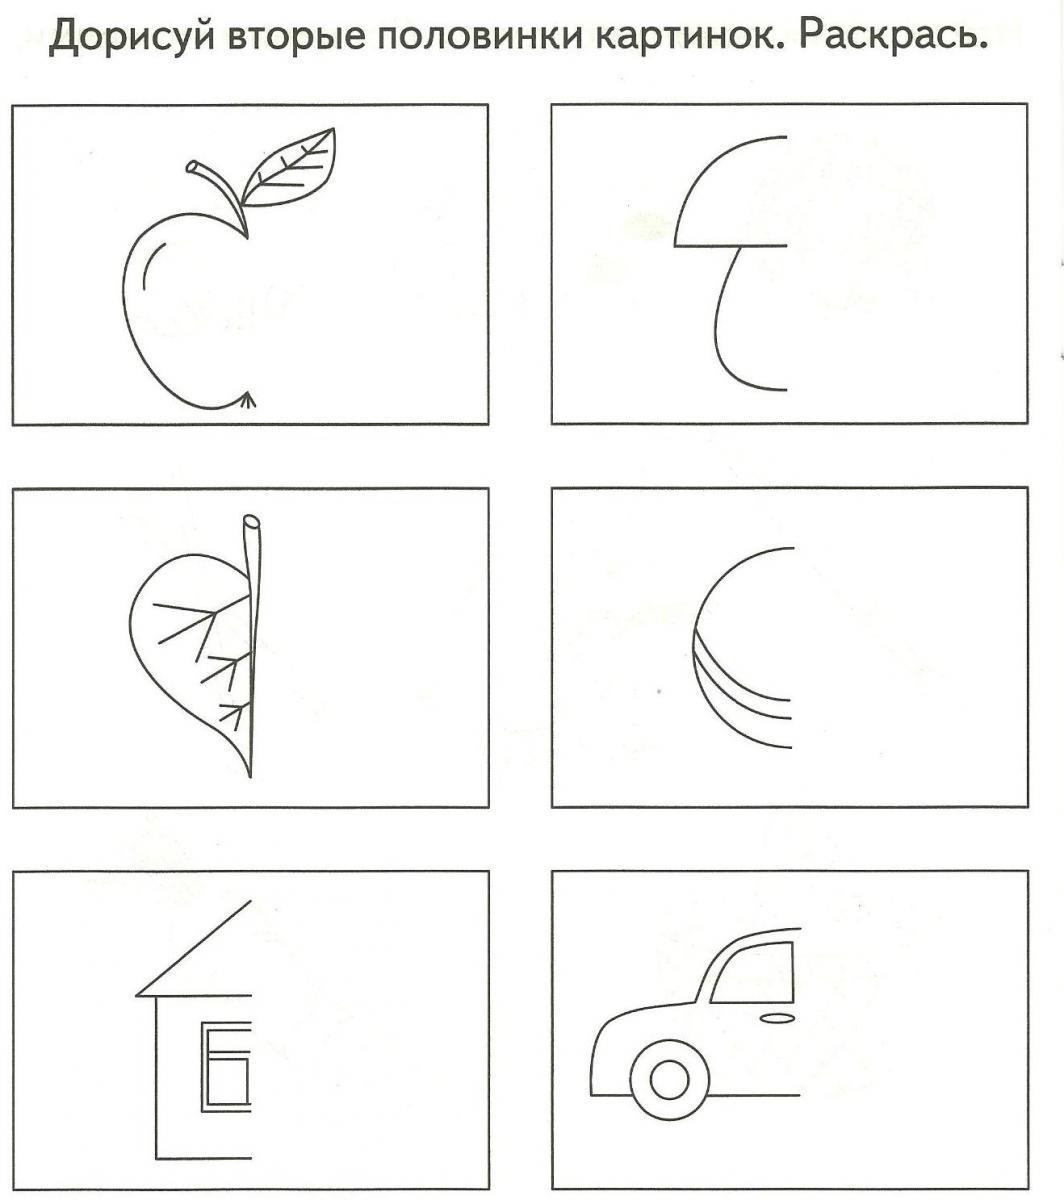 Дорисуйте детали картинки